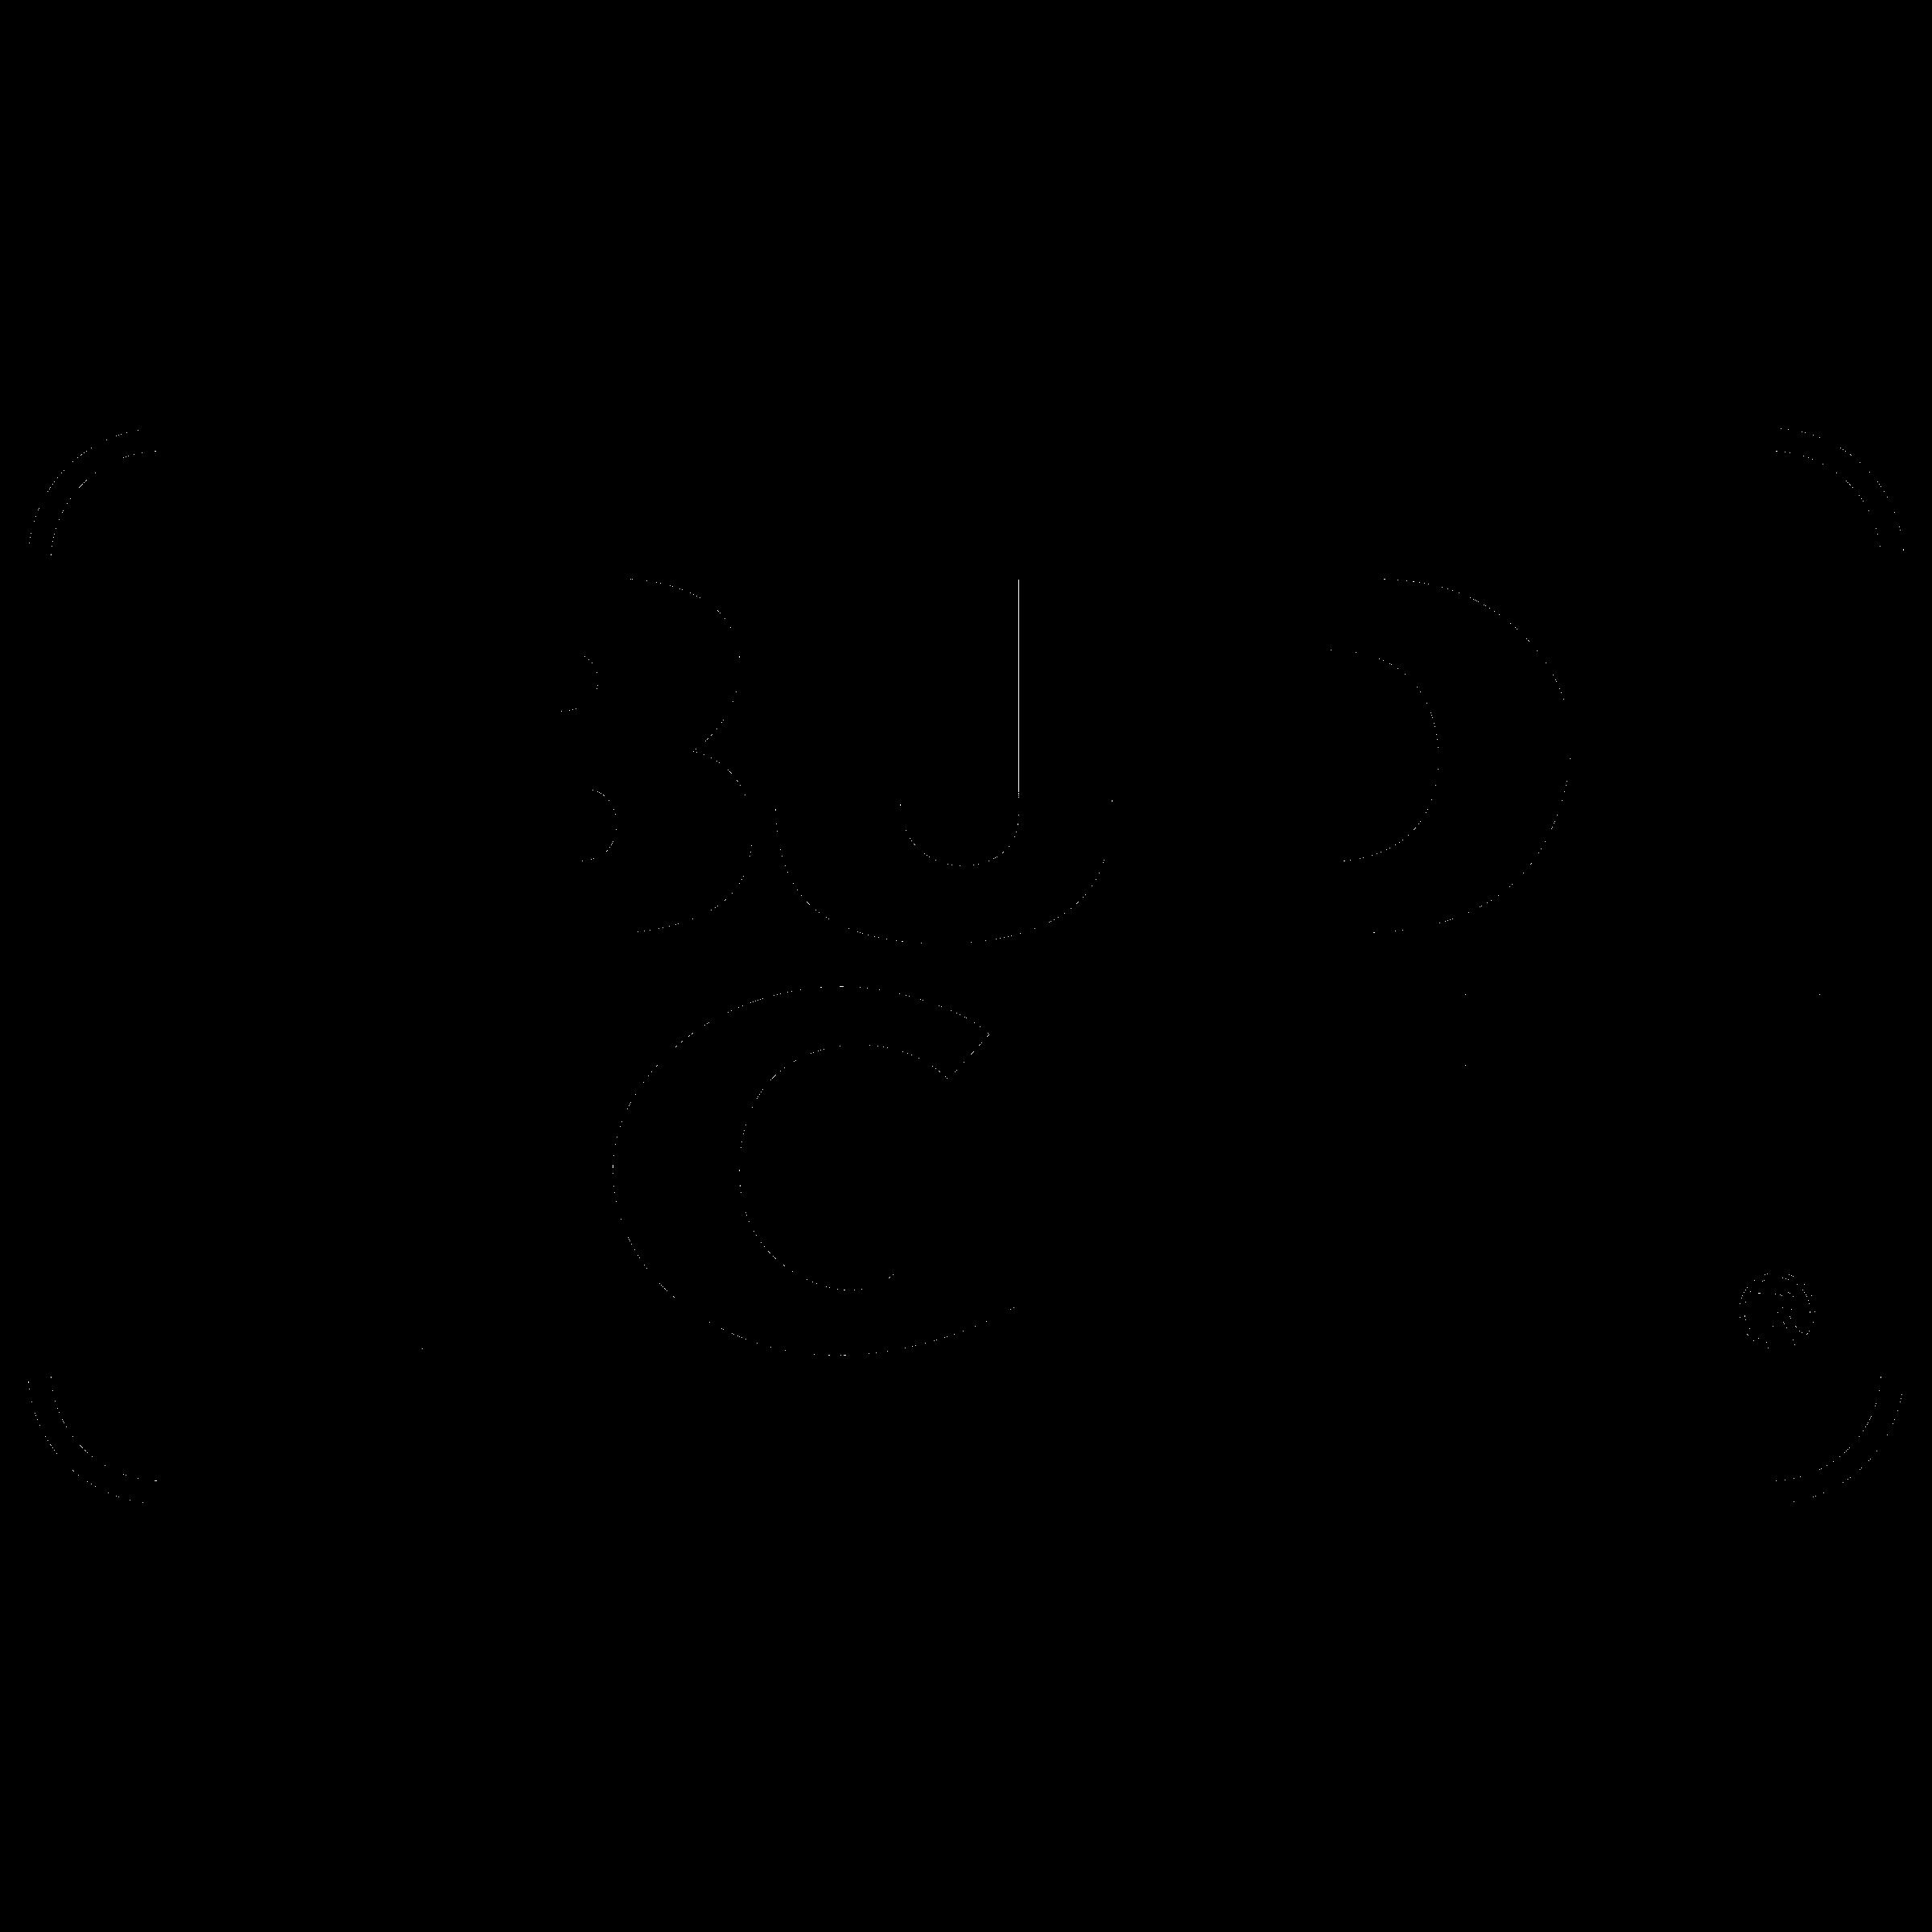 bud-light-logo-black-and-white.png